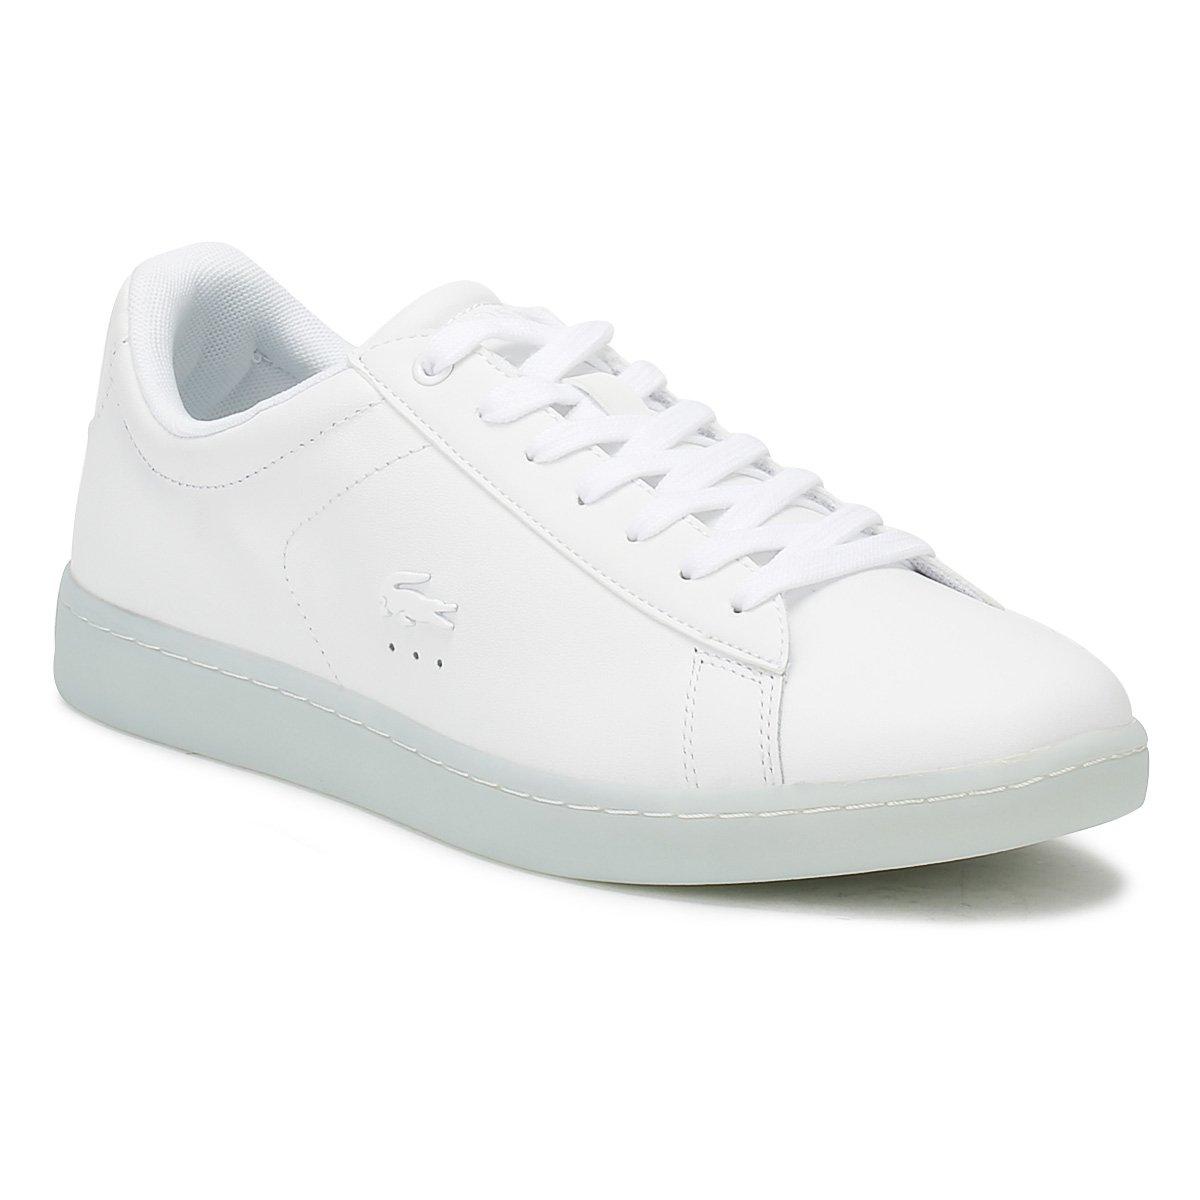 b264da65c28 Lacoste Femmes Blanc   Light Bleu Carnaby EVO 118 3 Basket  Amazon.fr   Chaussures et Sacs